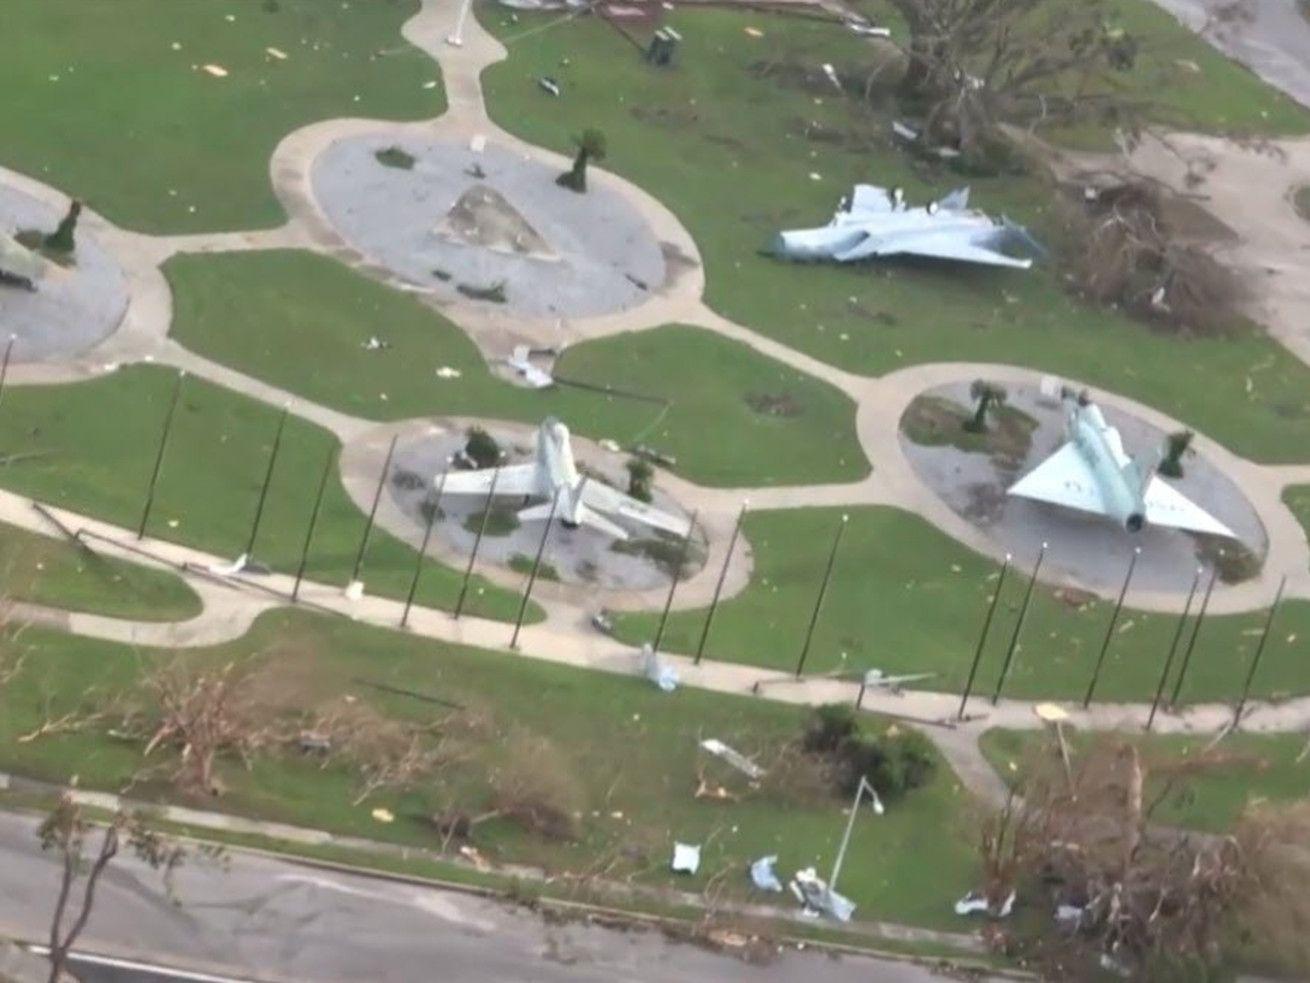 Hurricane Michael Showed How Woefully Unprepared The